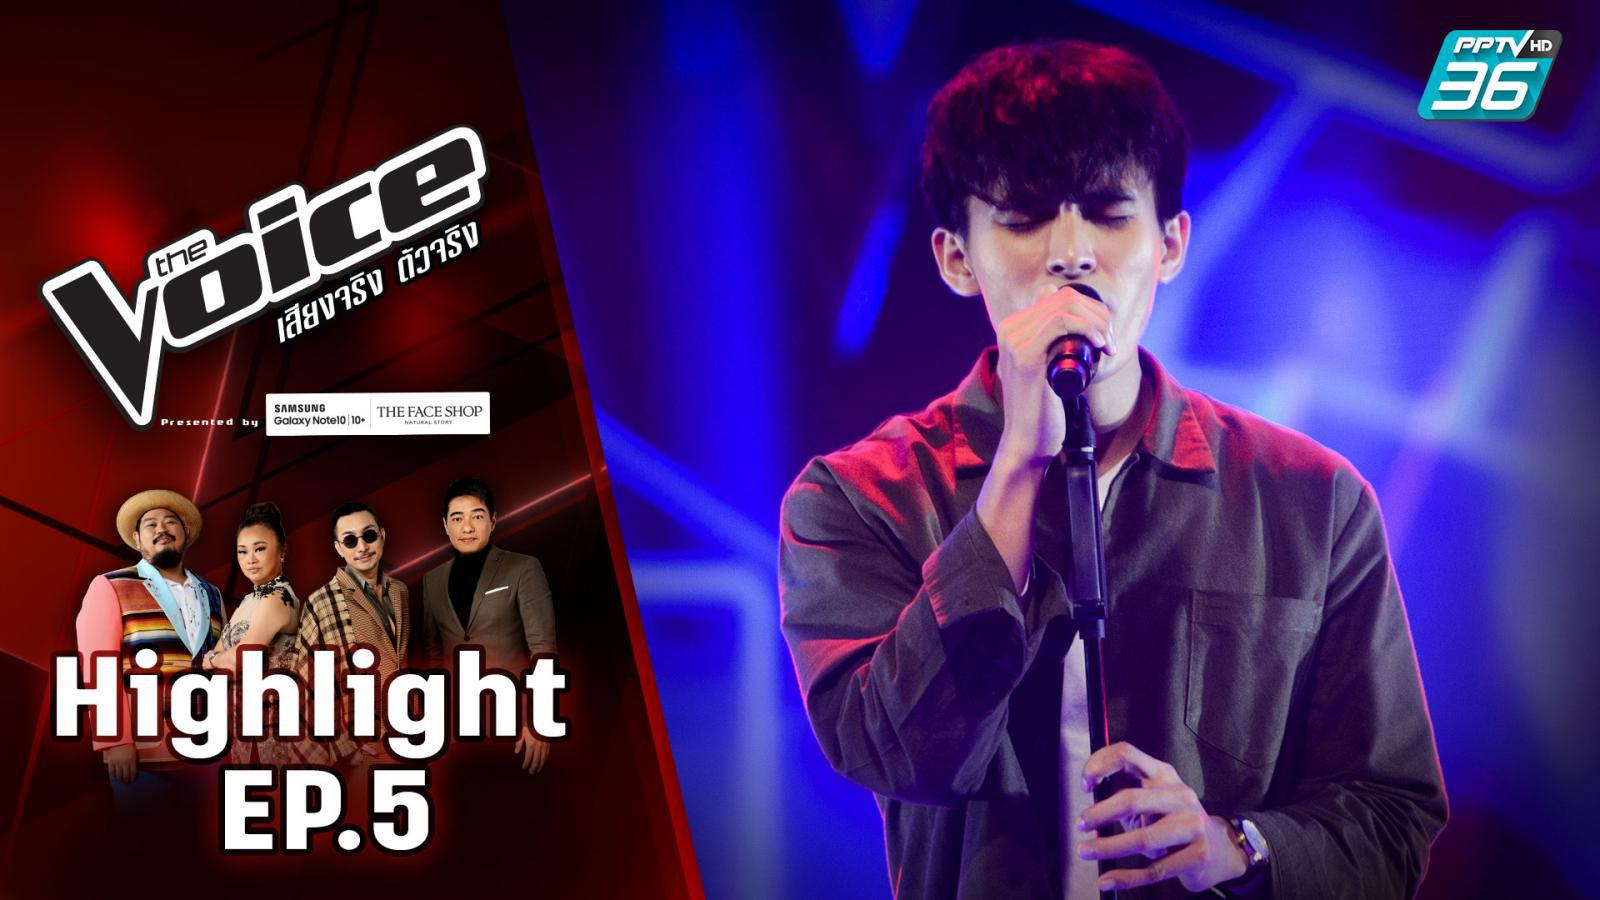 The Voice 2019 | เจมส์ ครูสอนร้องเพลงวัย 23 ที่มีเสียงร้องชวนหลง  | Highlight EP5